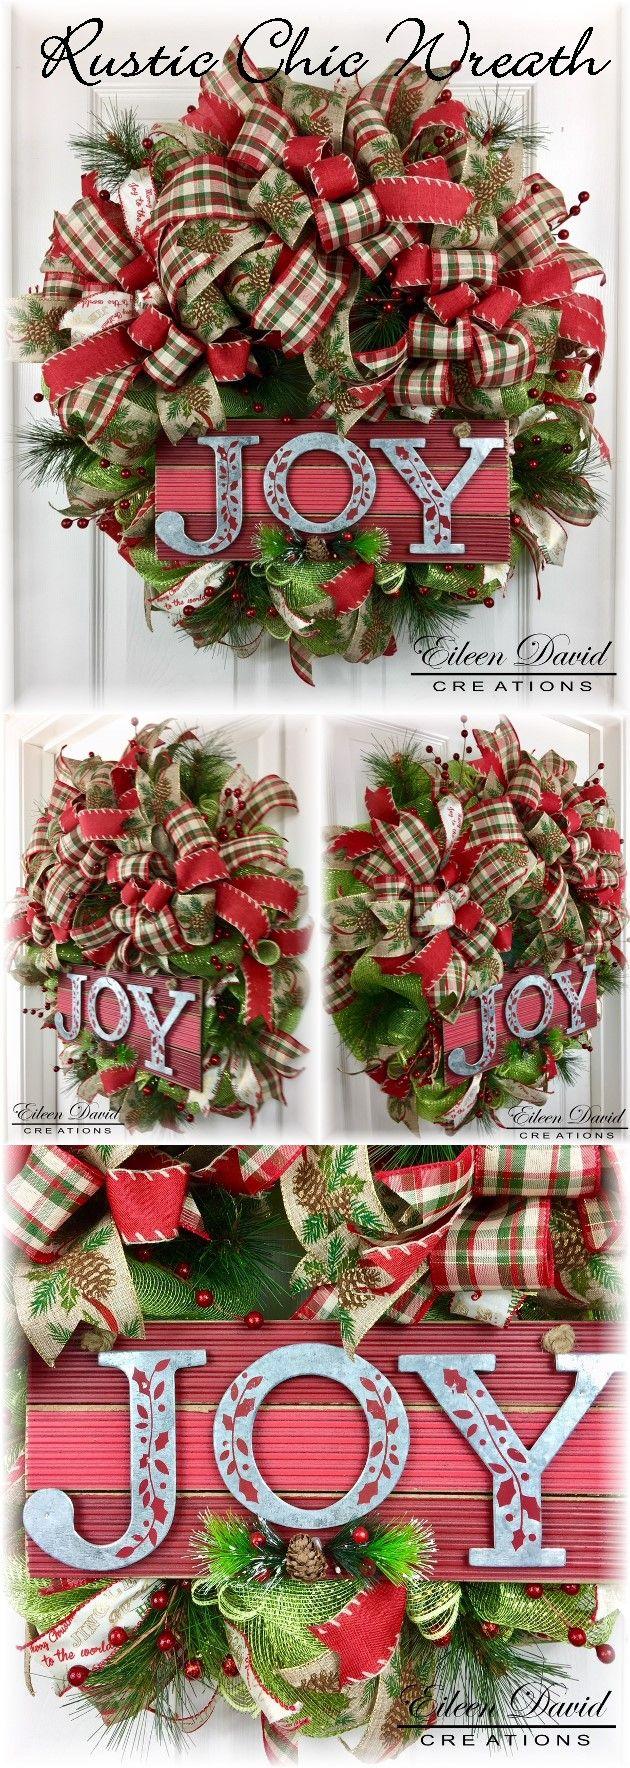 Wreath, Christmas Wreath, Joy, Holiday Decoration, Rustic, Rustic Chic, Door Decor,